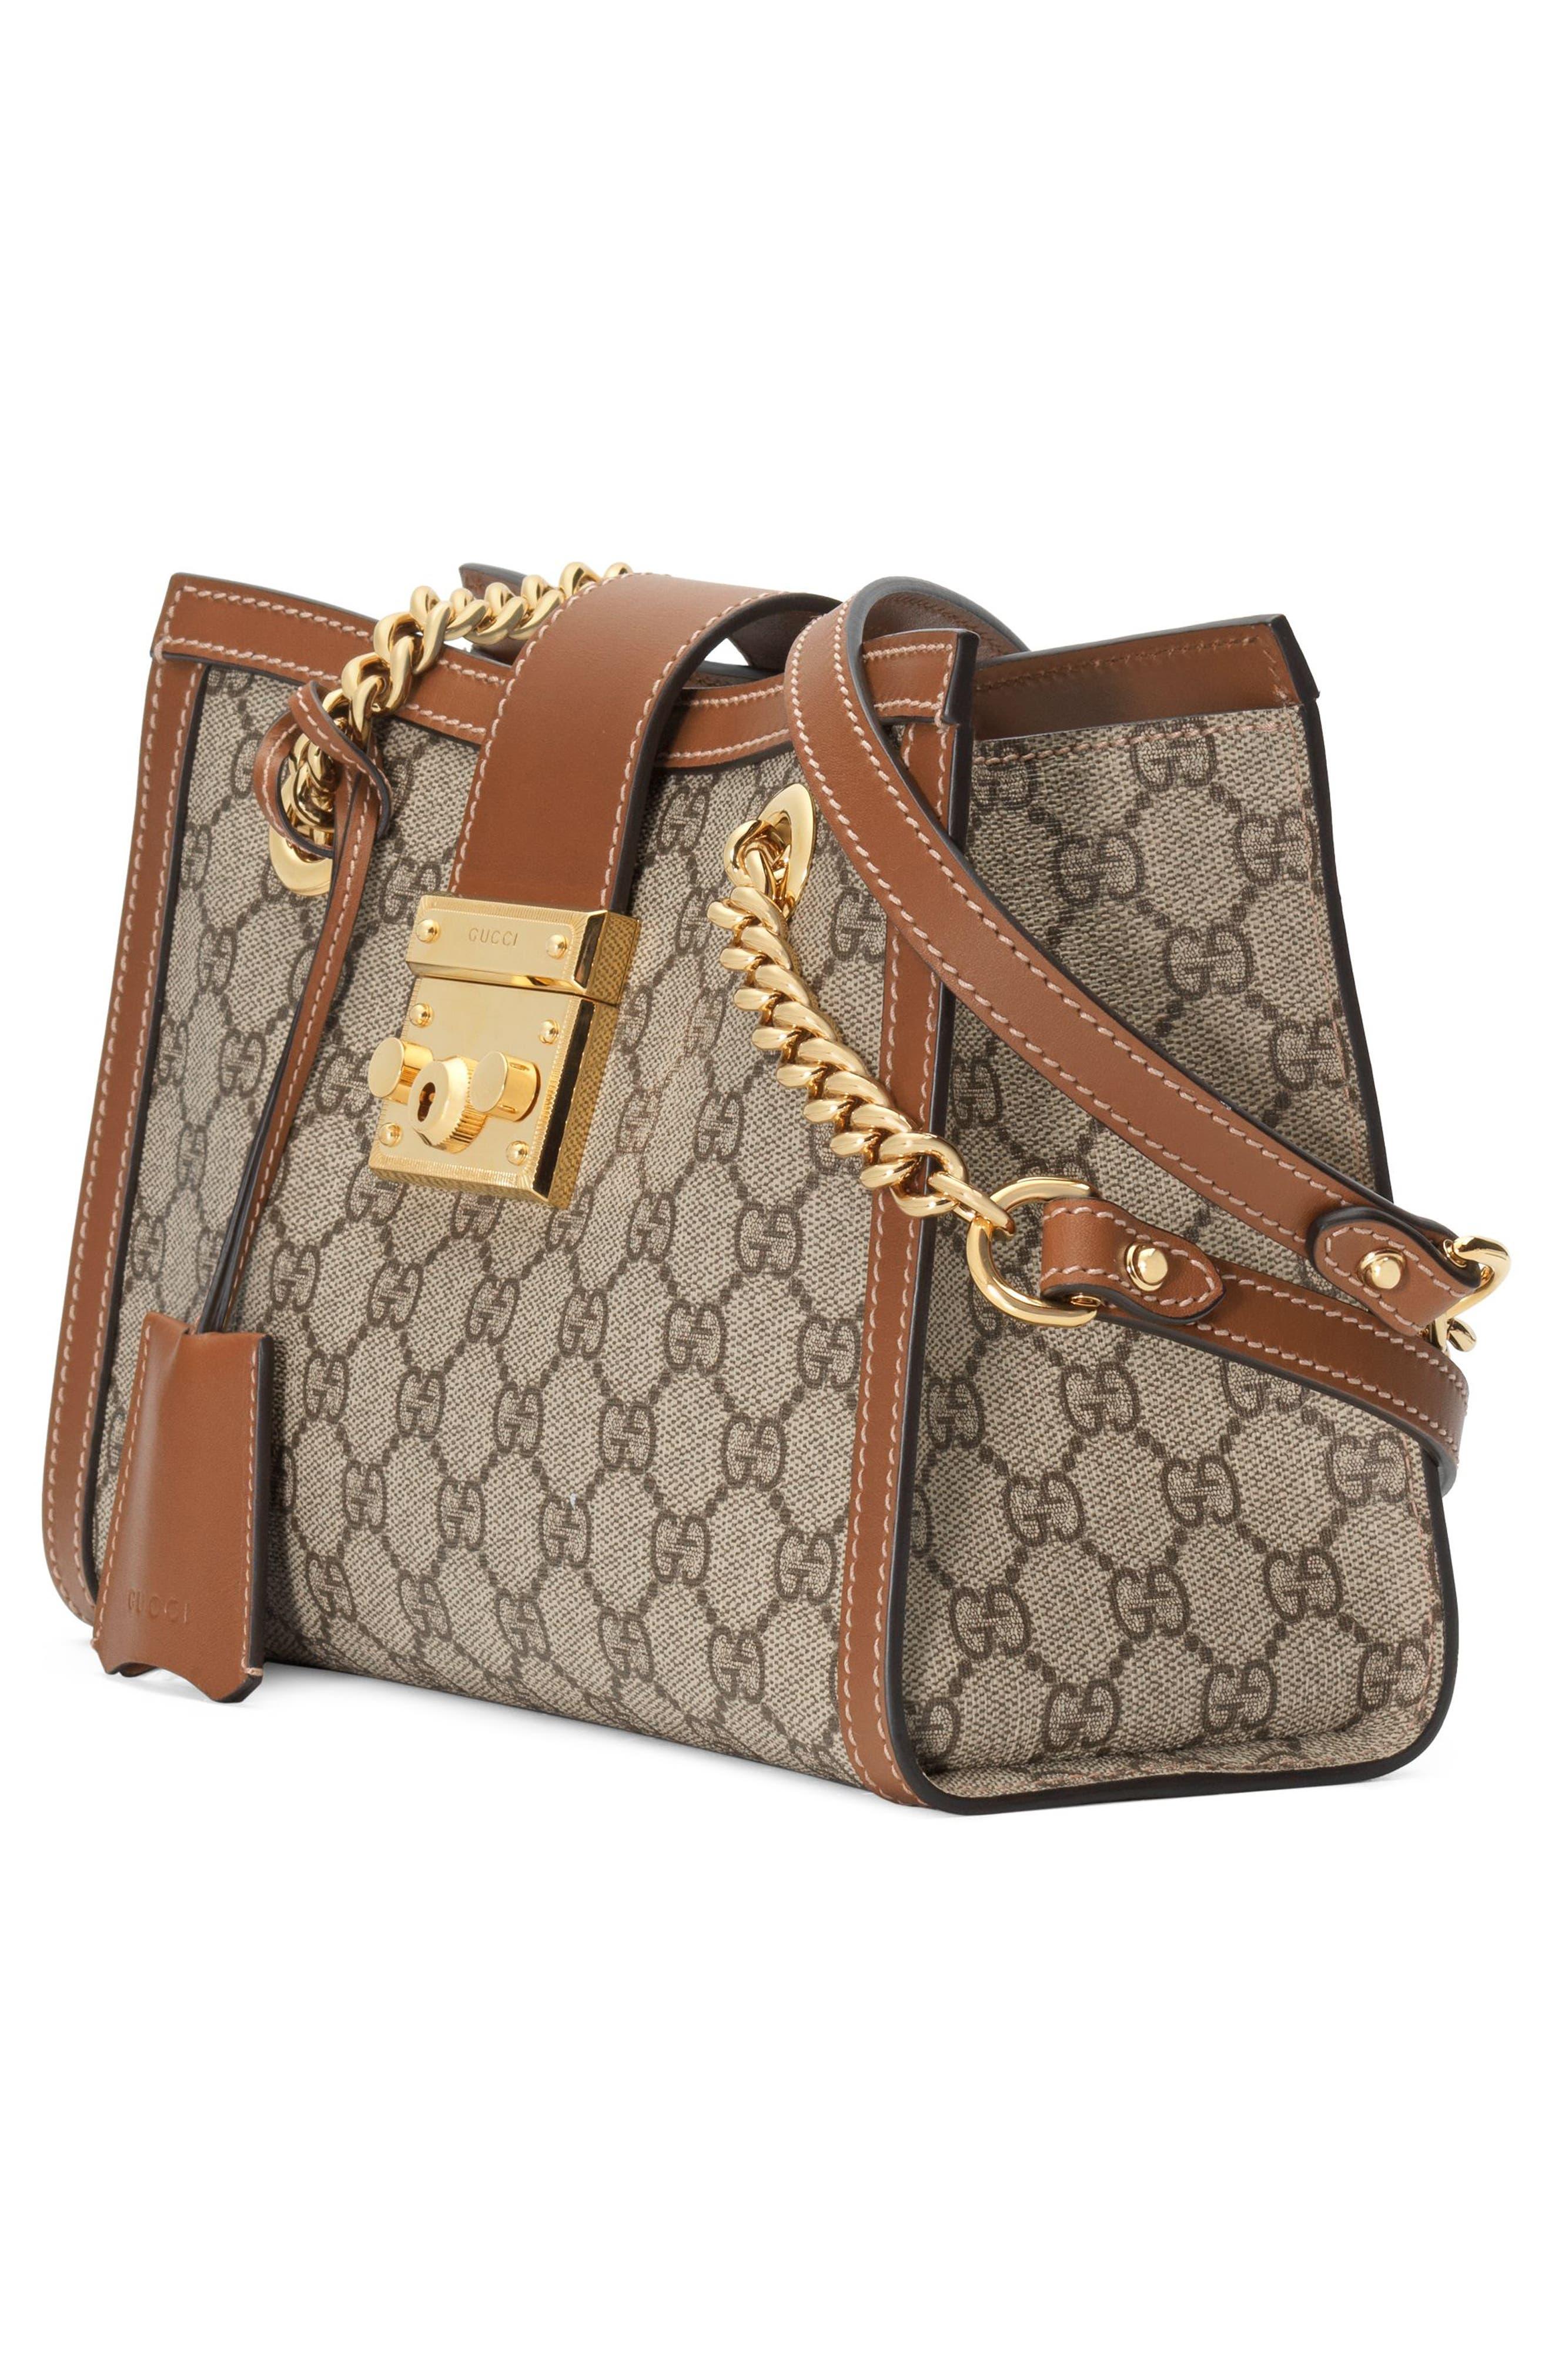 Small Padlock GG Supreme Shoulder Bag,                             Alternate thumbnail 4, color,                             BEIGE EBONY/ TUSCANY